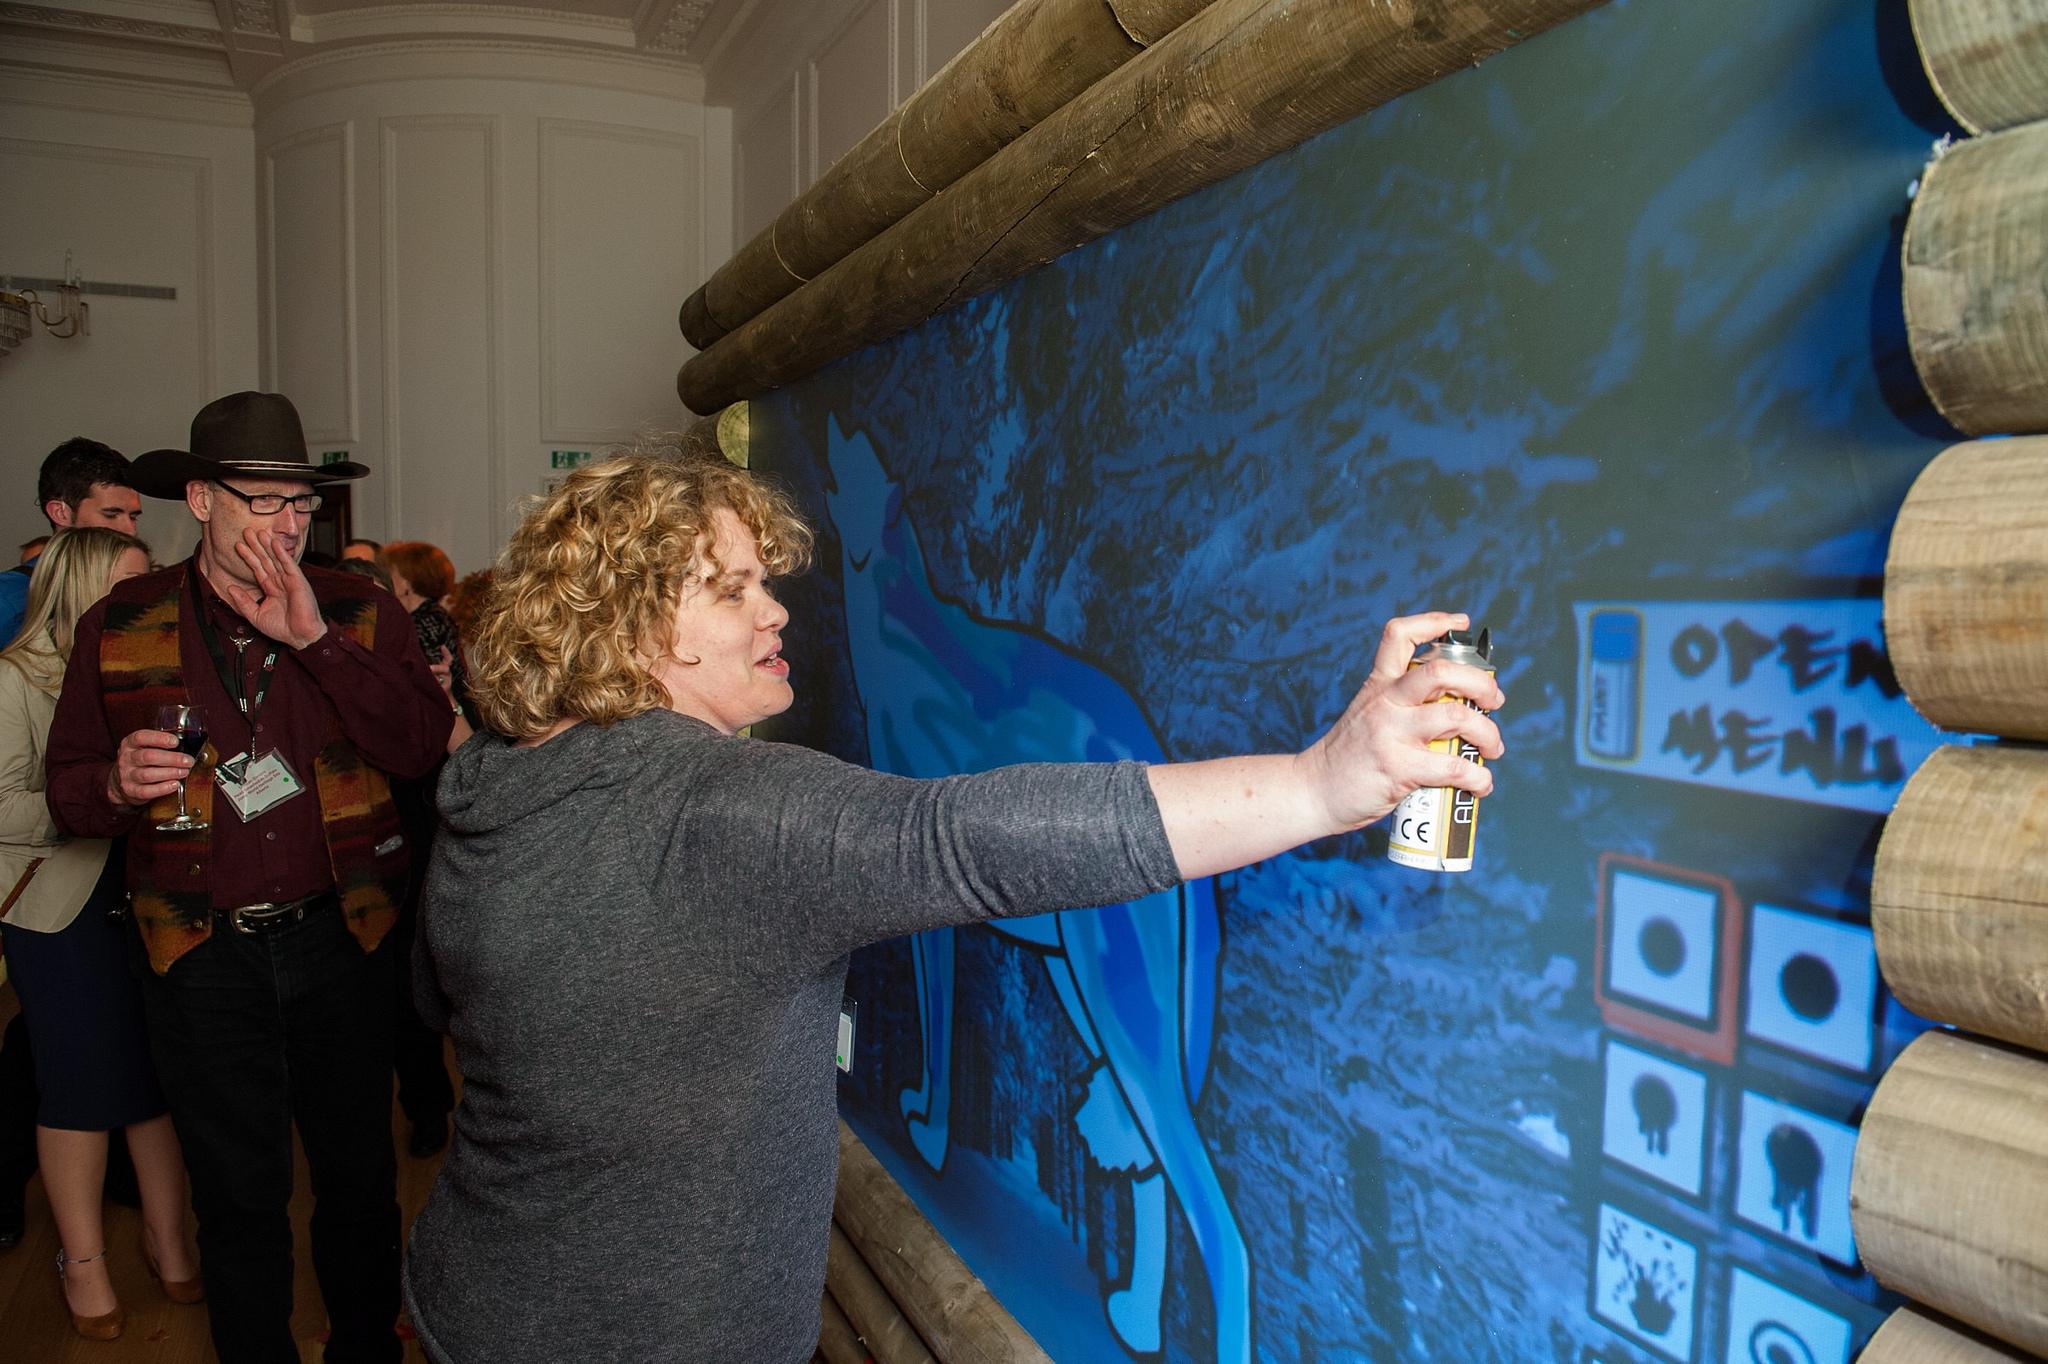 Interactive graffiti wall uk - An Error Occurred